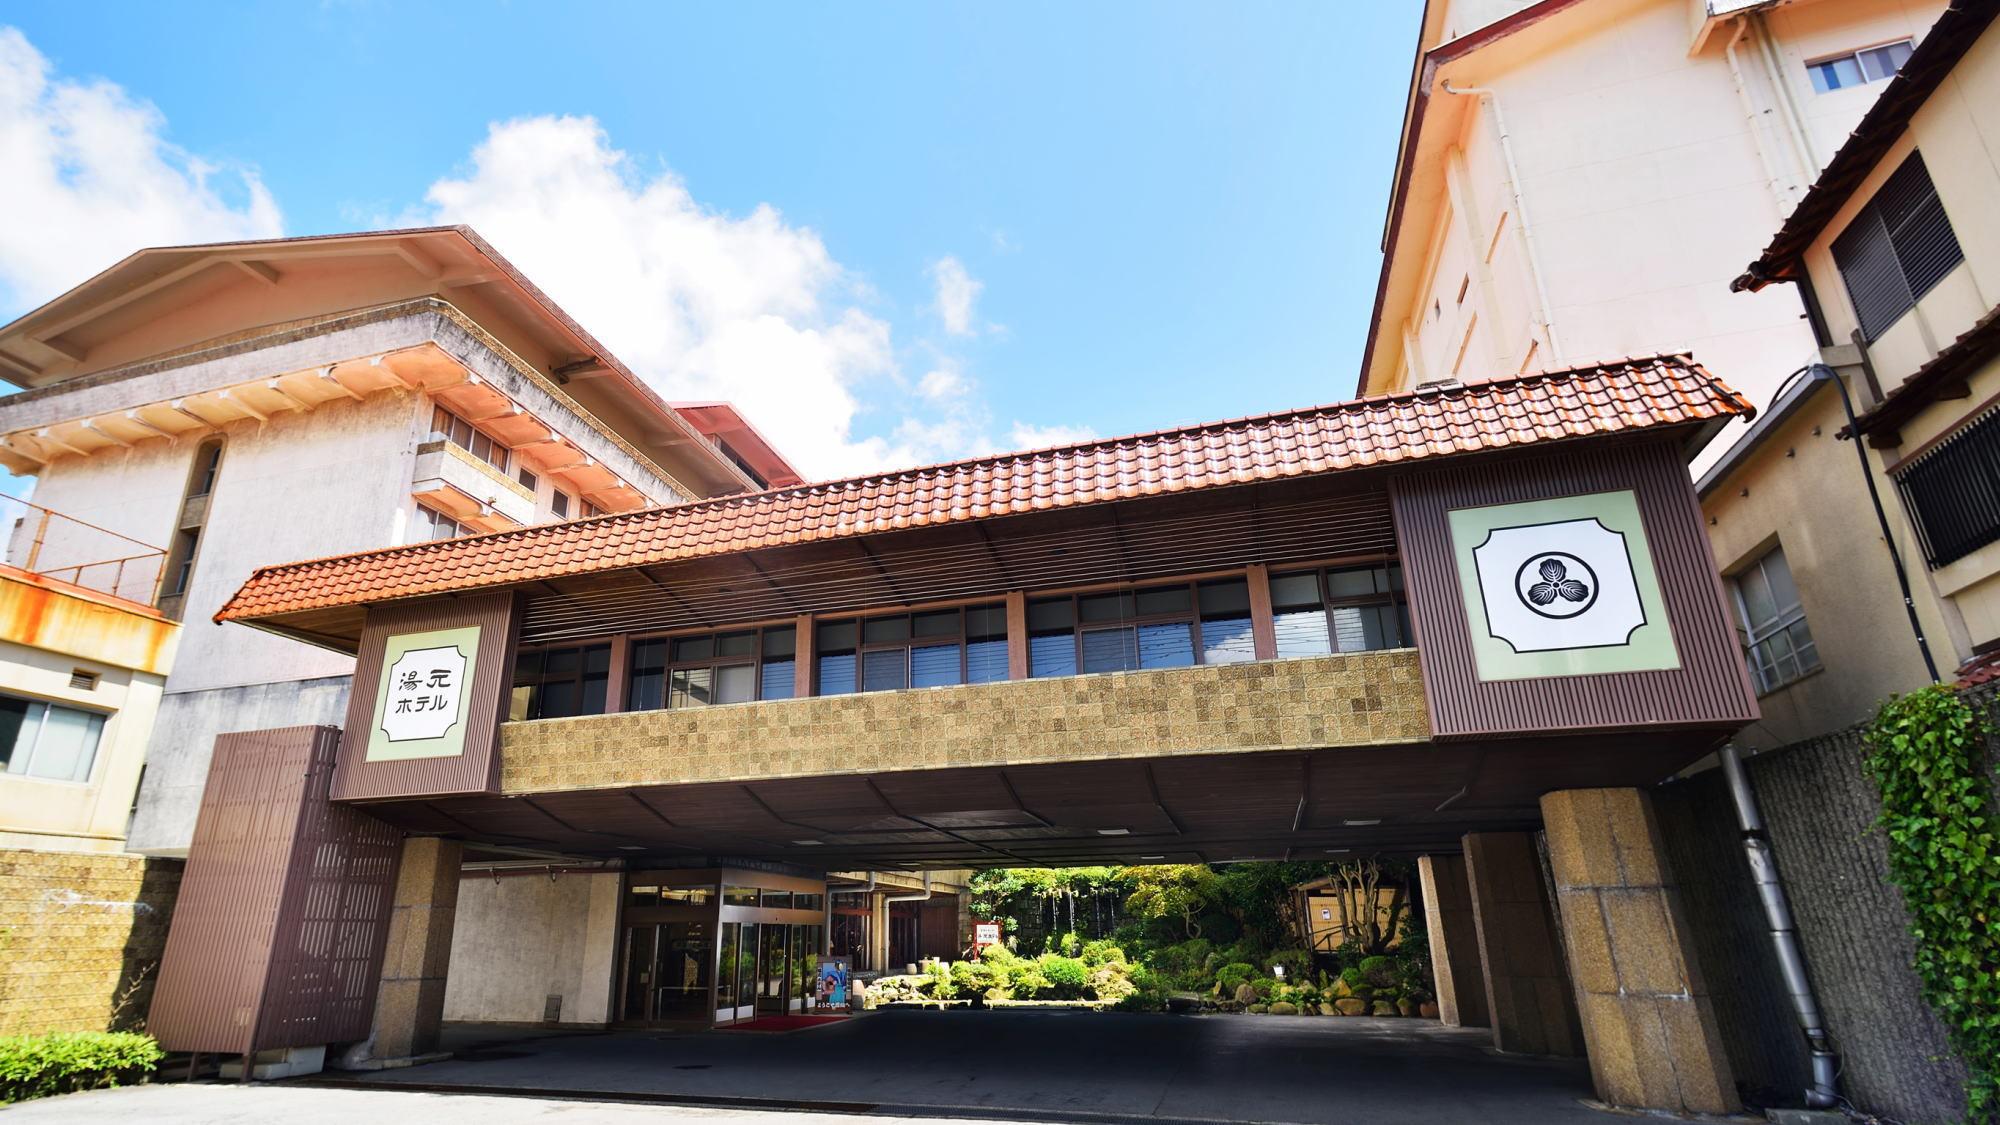 雲仙温泉 創業元禄八年 雲仙湯守の宿 湯元ホテル